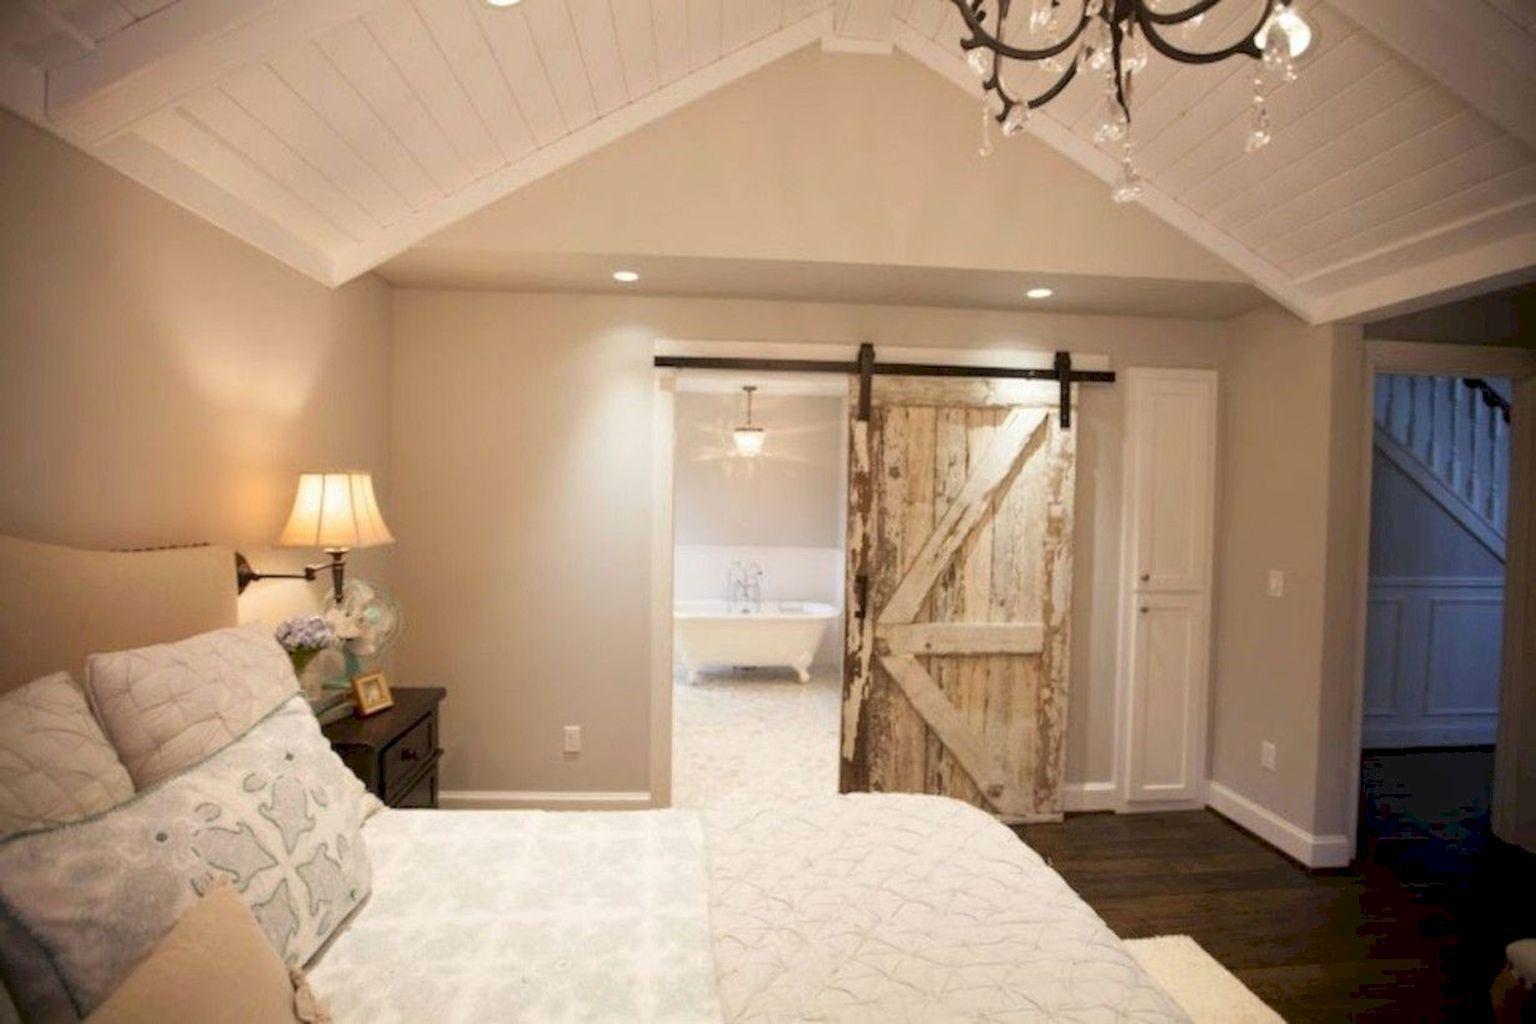 Camera Da Letto Padronale The Sims : Master bedroom ideas sims masterbedroomideas arredamento the